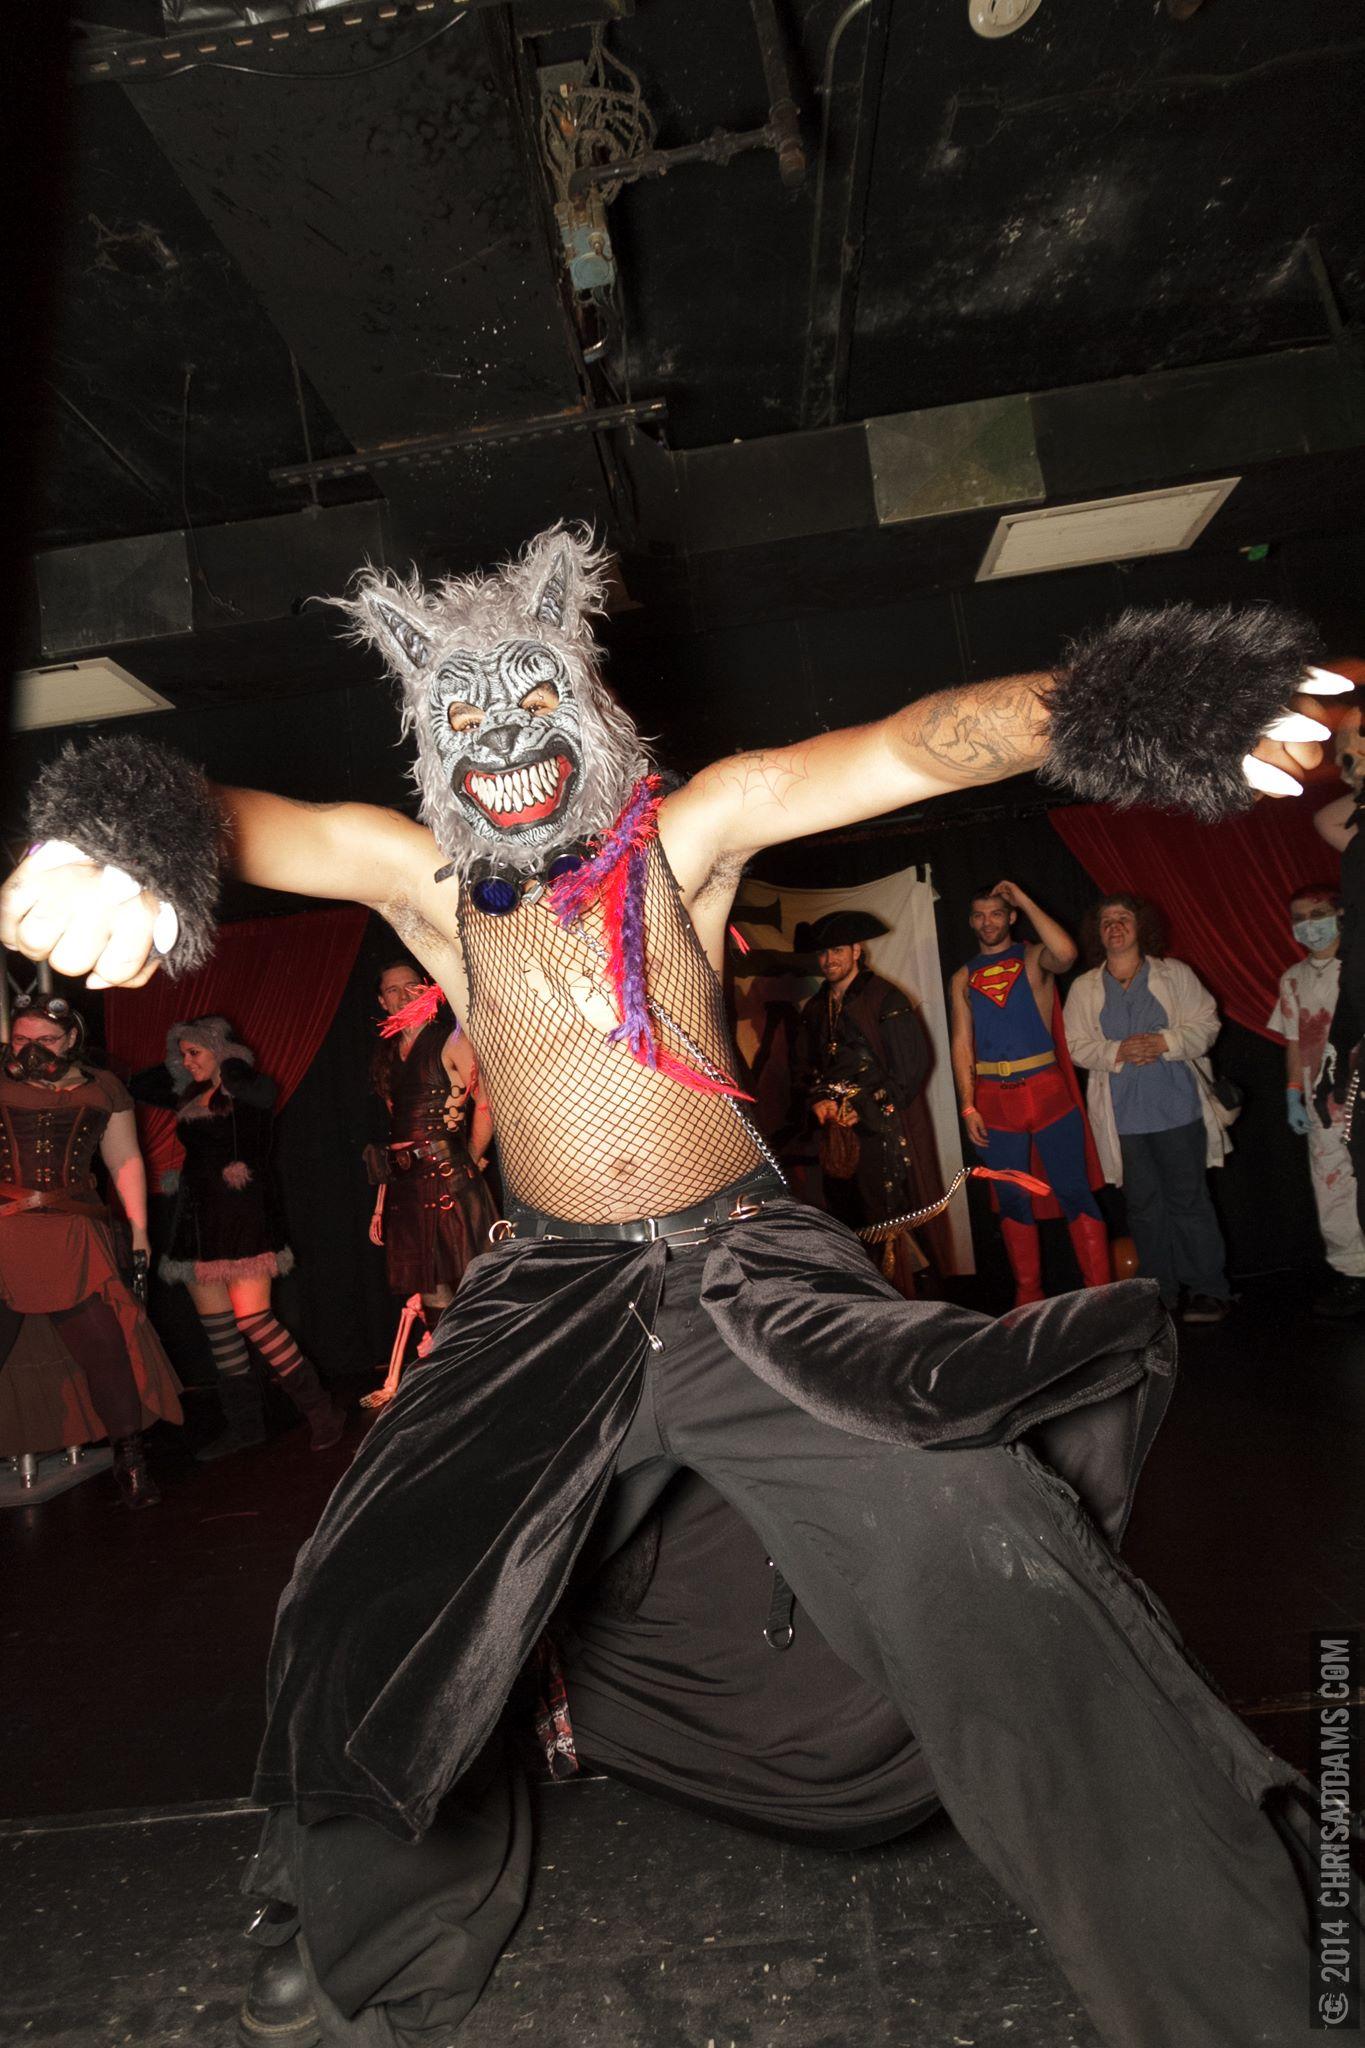 TheHavenClub-Goth-Industrial-Dance-Alternative-Northampton-MA (81).jpg